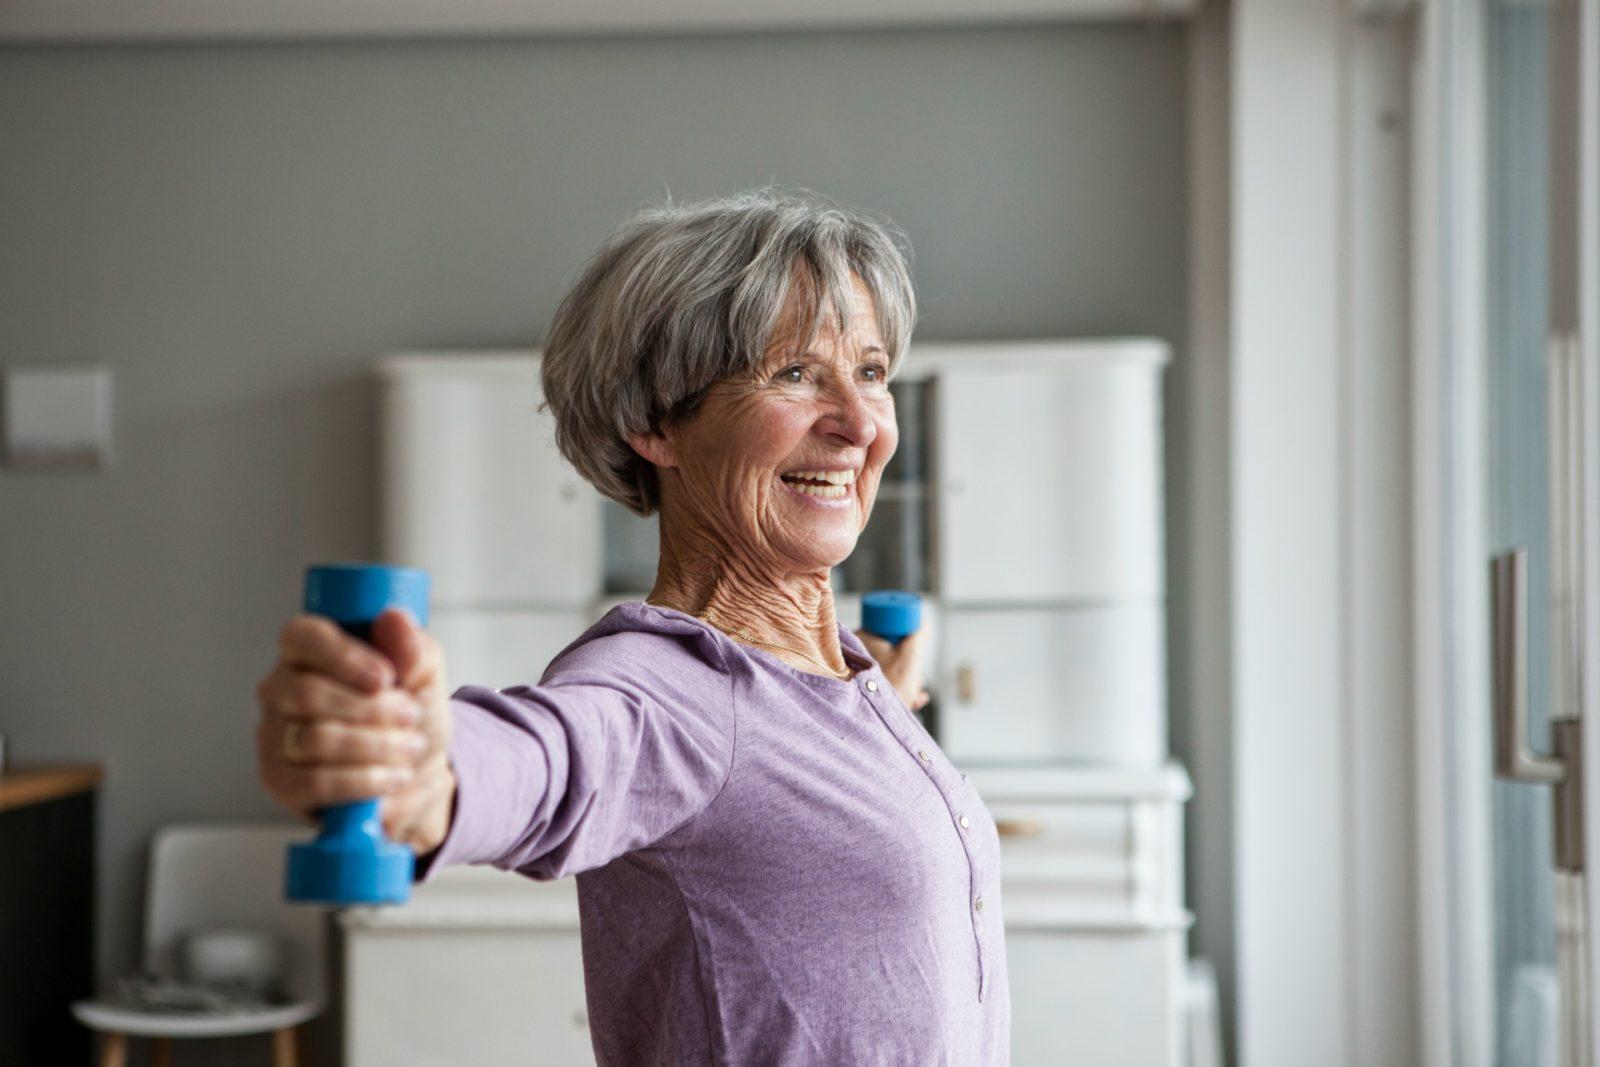 weight training senior woman